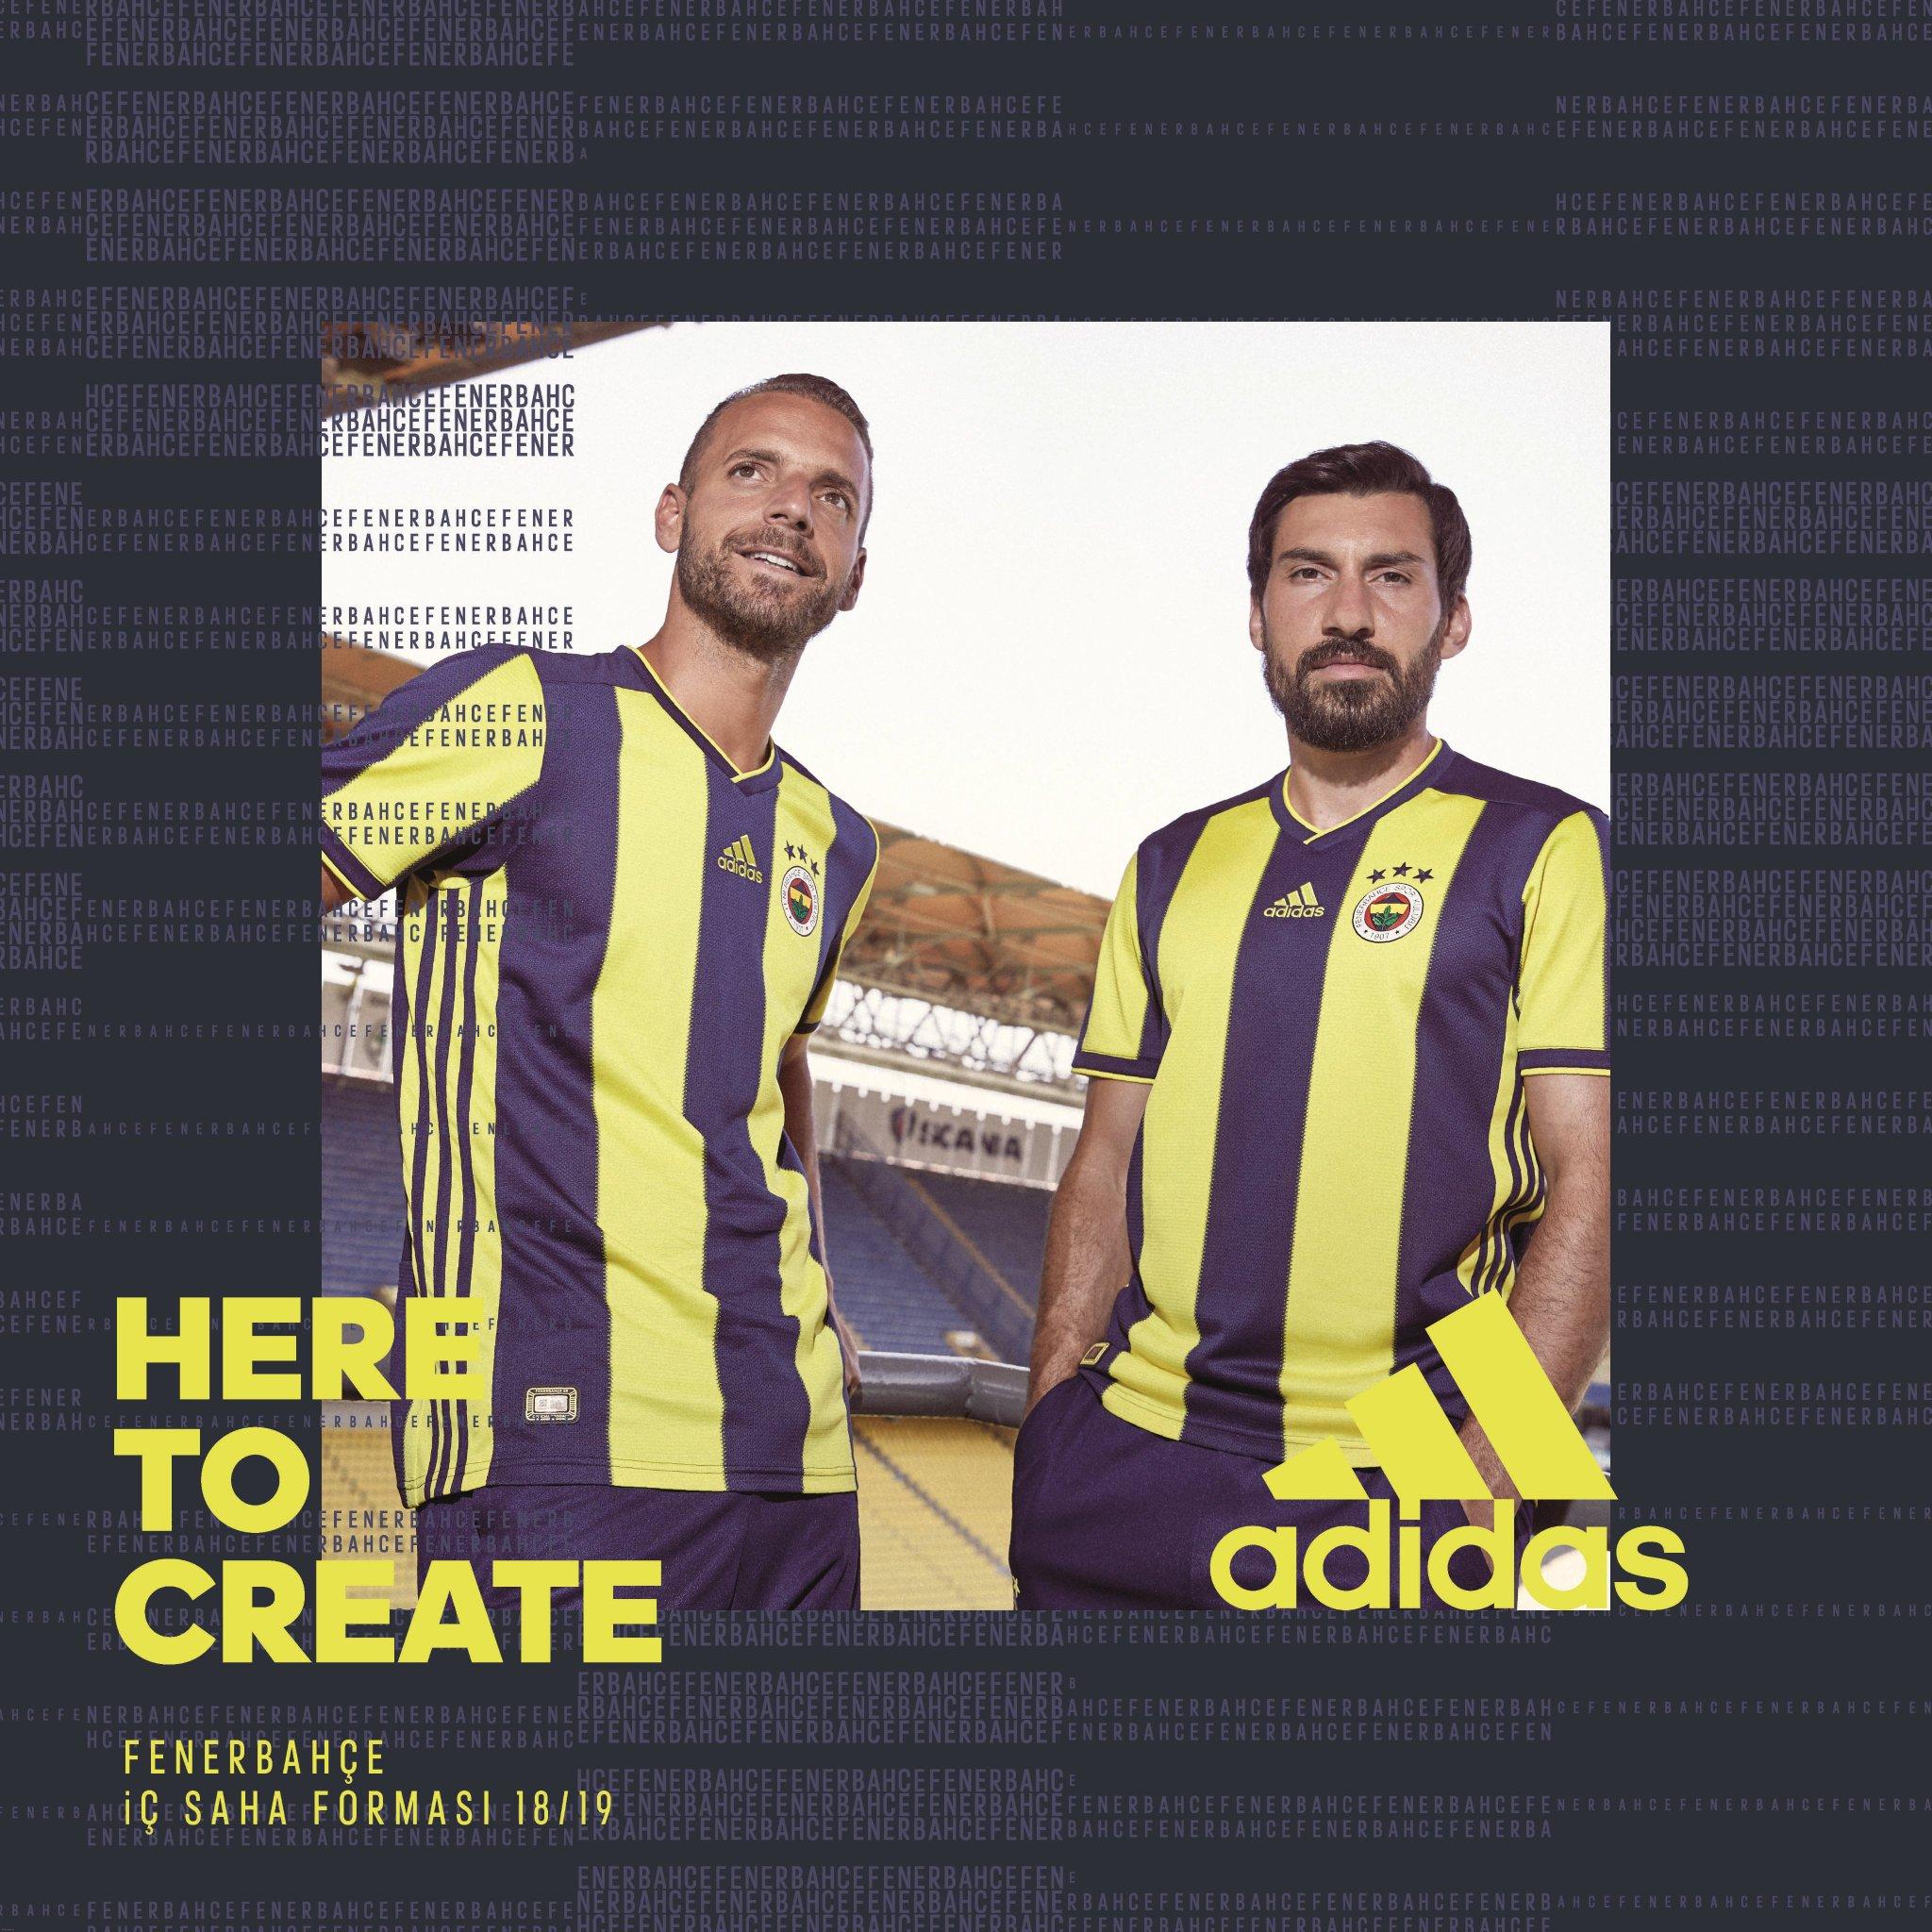 İşte Fenerbahçe'nin yeni sezon formaları https://t.co/0fbhYweIp4 https://t.co/9RLhyPNhVh